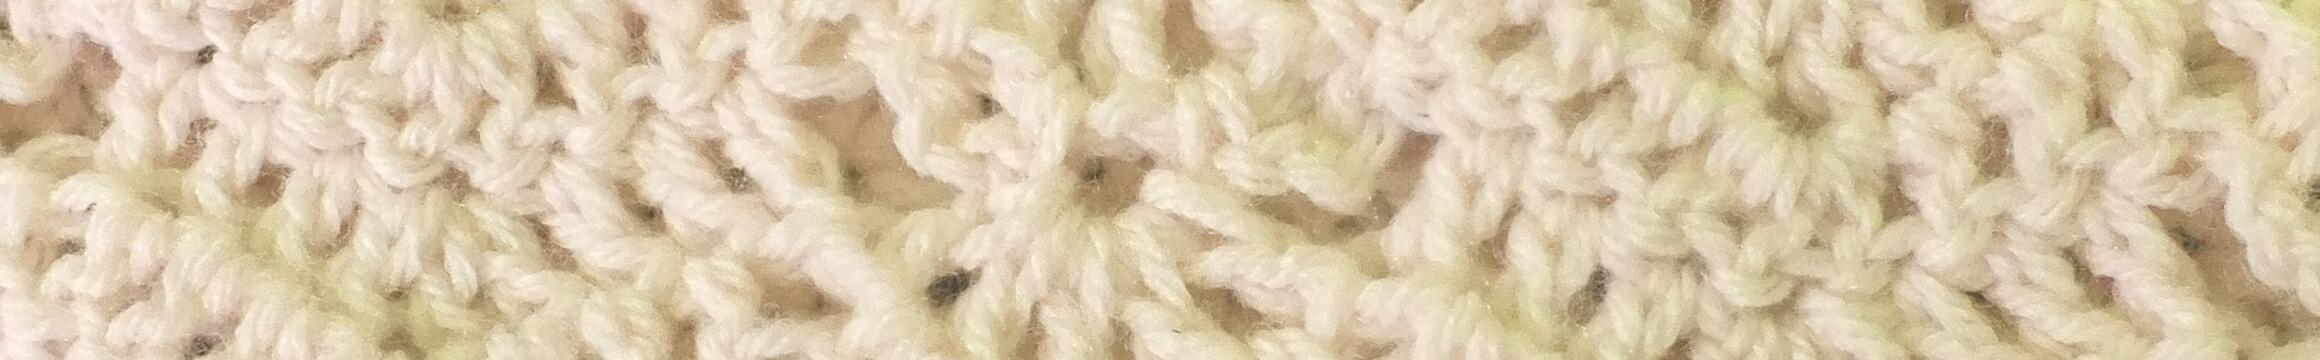 Baby Yarn 03